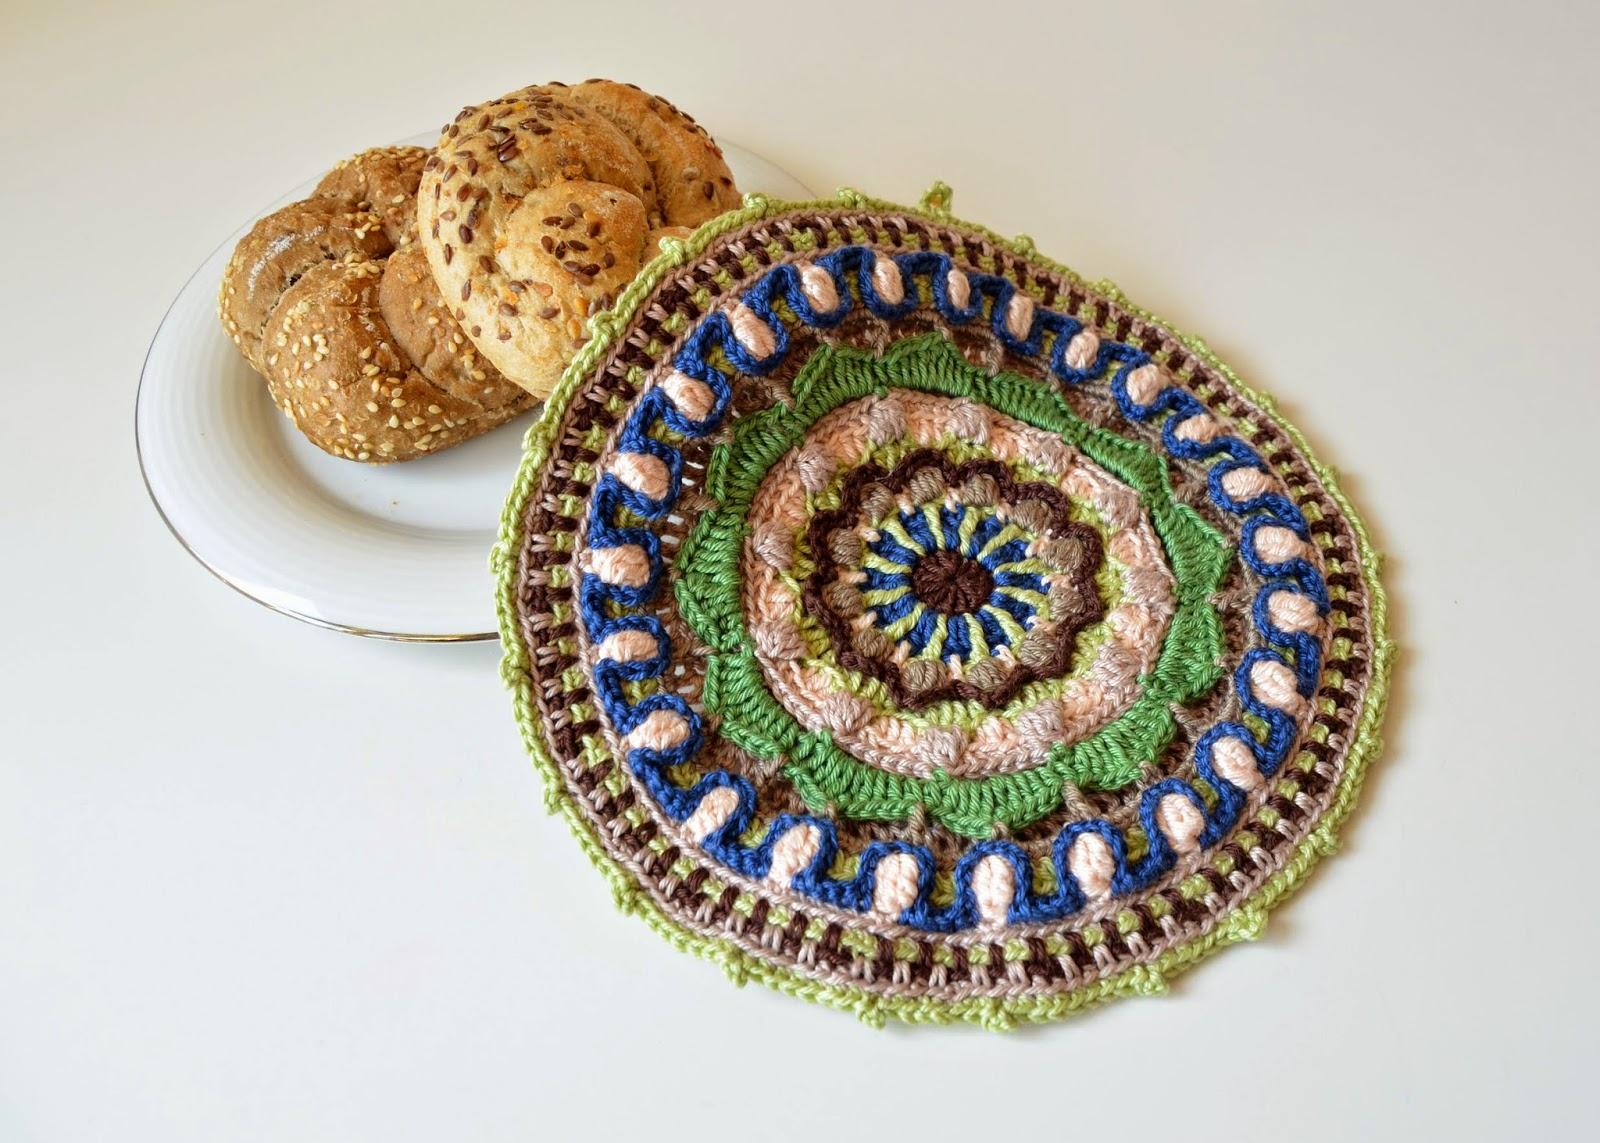 Crochet Patterns For Mandala Yarn : Crochet for Meditation: Colouring Mandala with Yarn ...